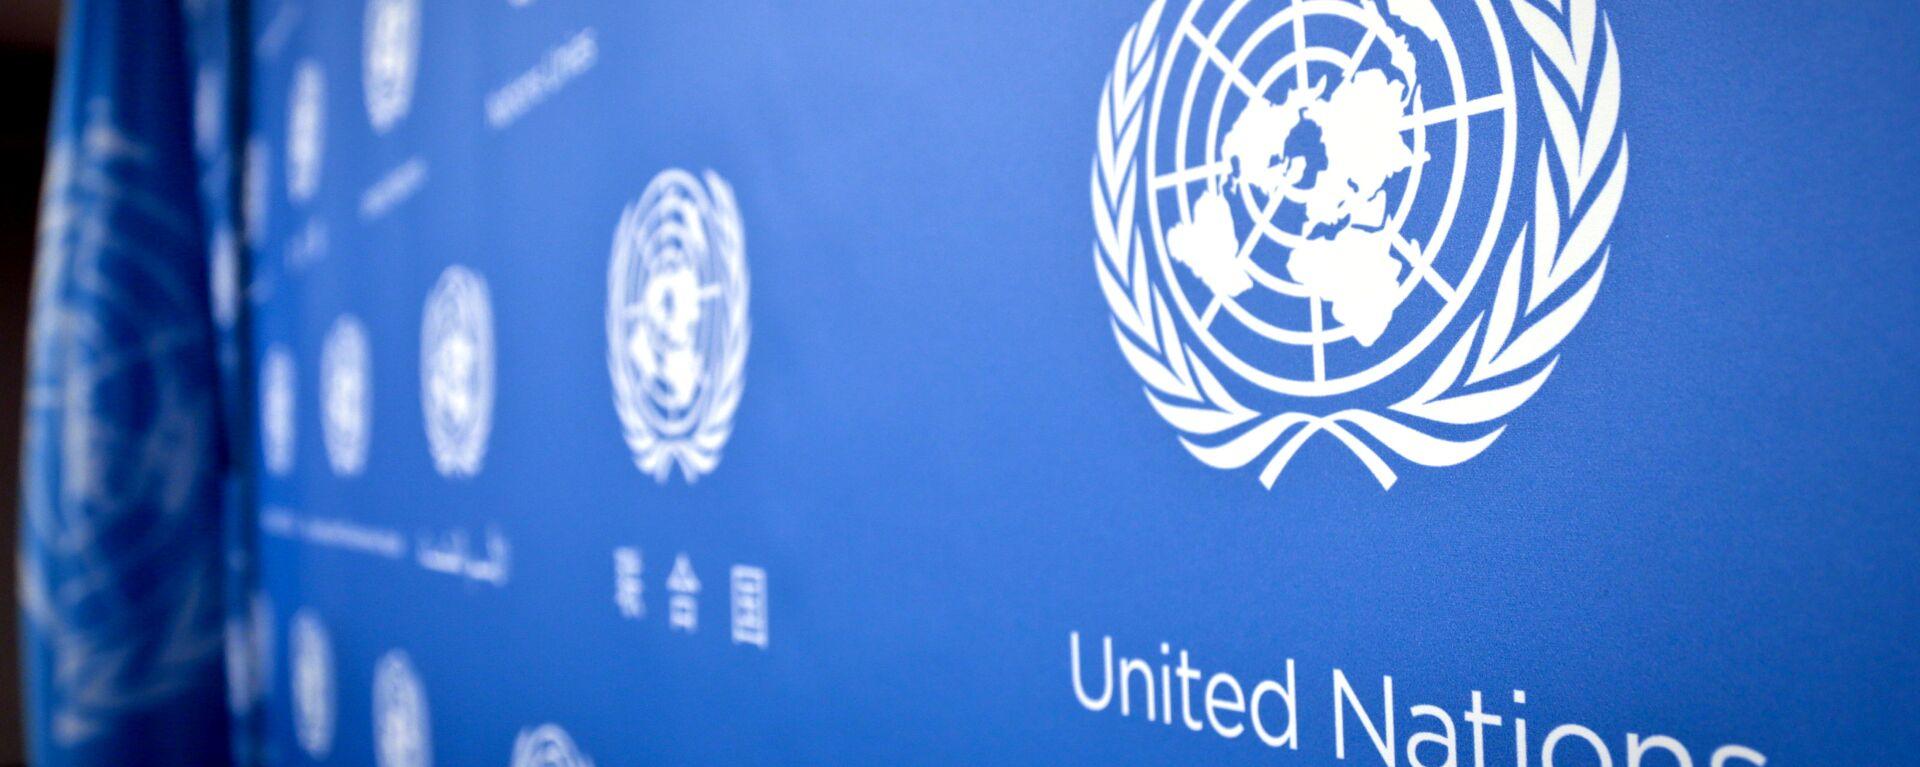 Logo de la ONU - Sputnik Mundo, 1920, 08.06.2021